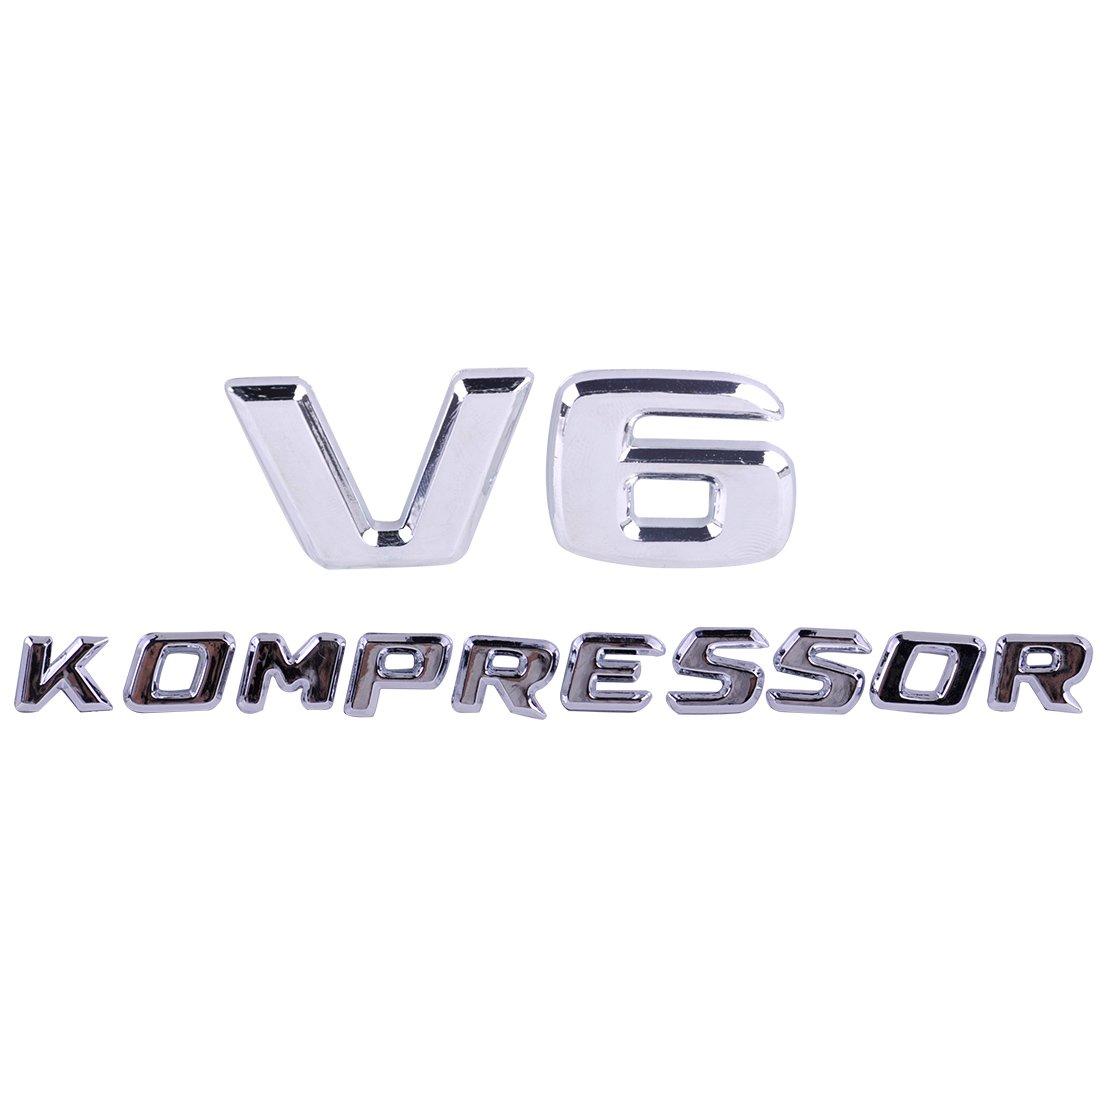 Daphot-Store - Car Kompressor V6/V8/V12 Letter Sticker Emblem Badge Self Adhesive Decoration Decal Luxury Customized